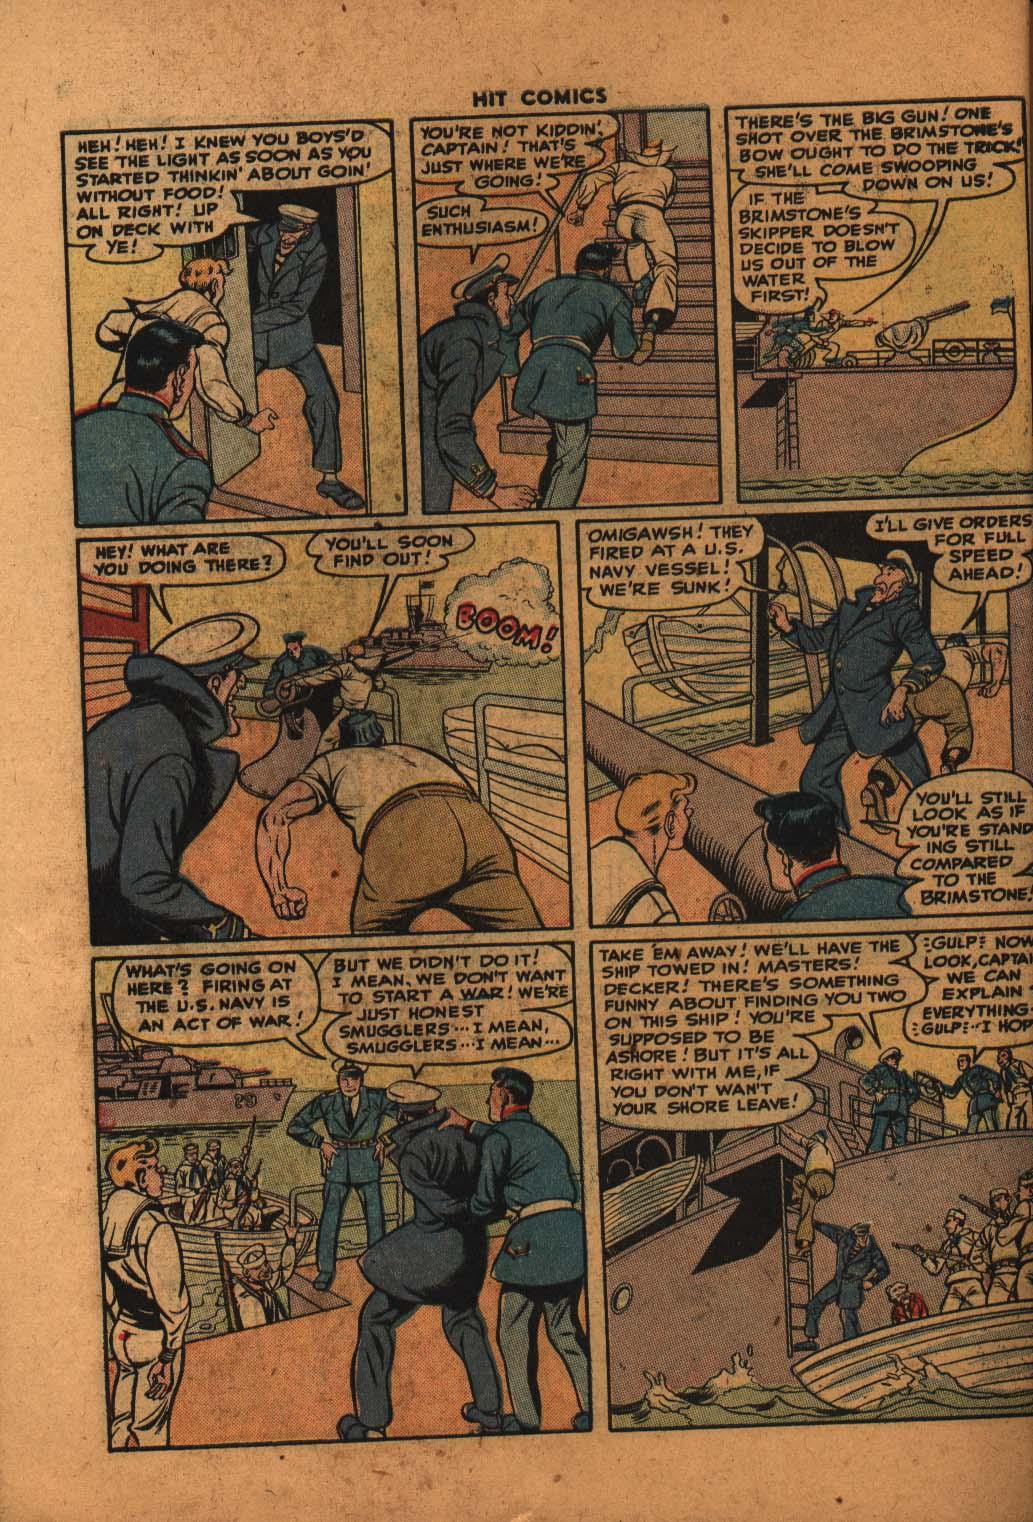 Read online Hit Comics comic -  Issue #47 - 43